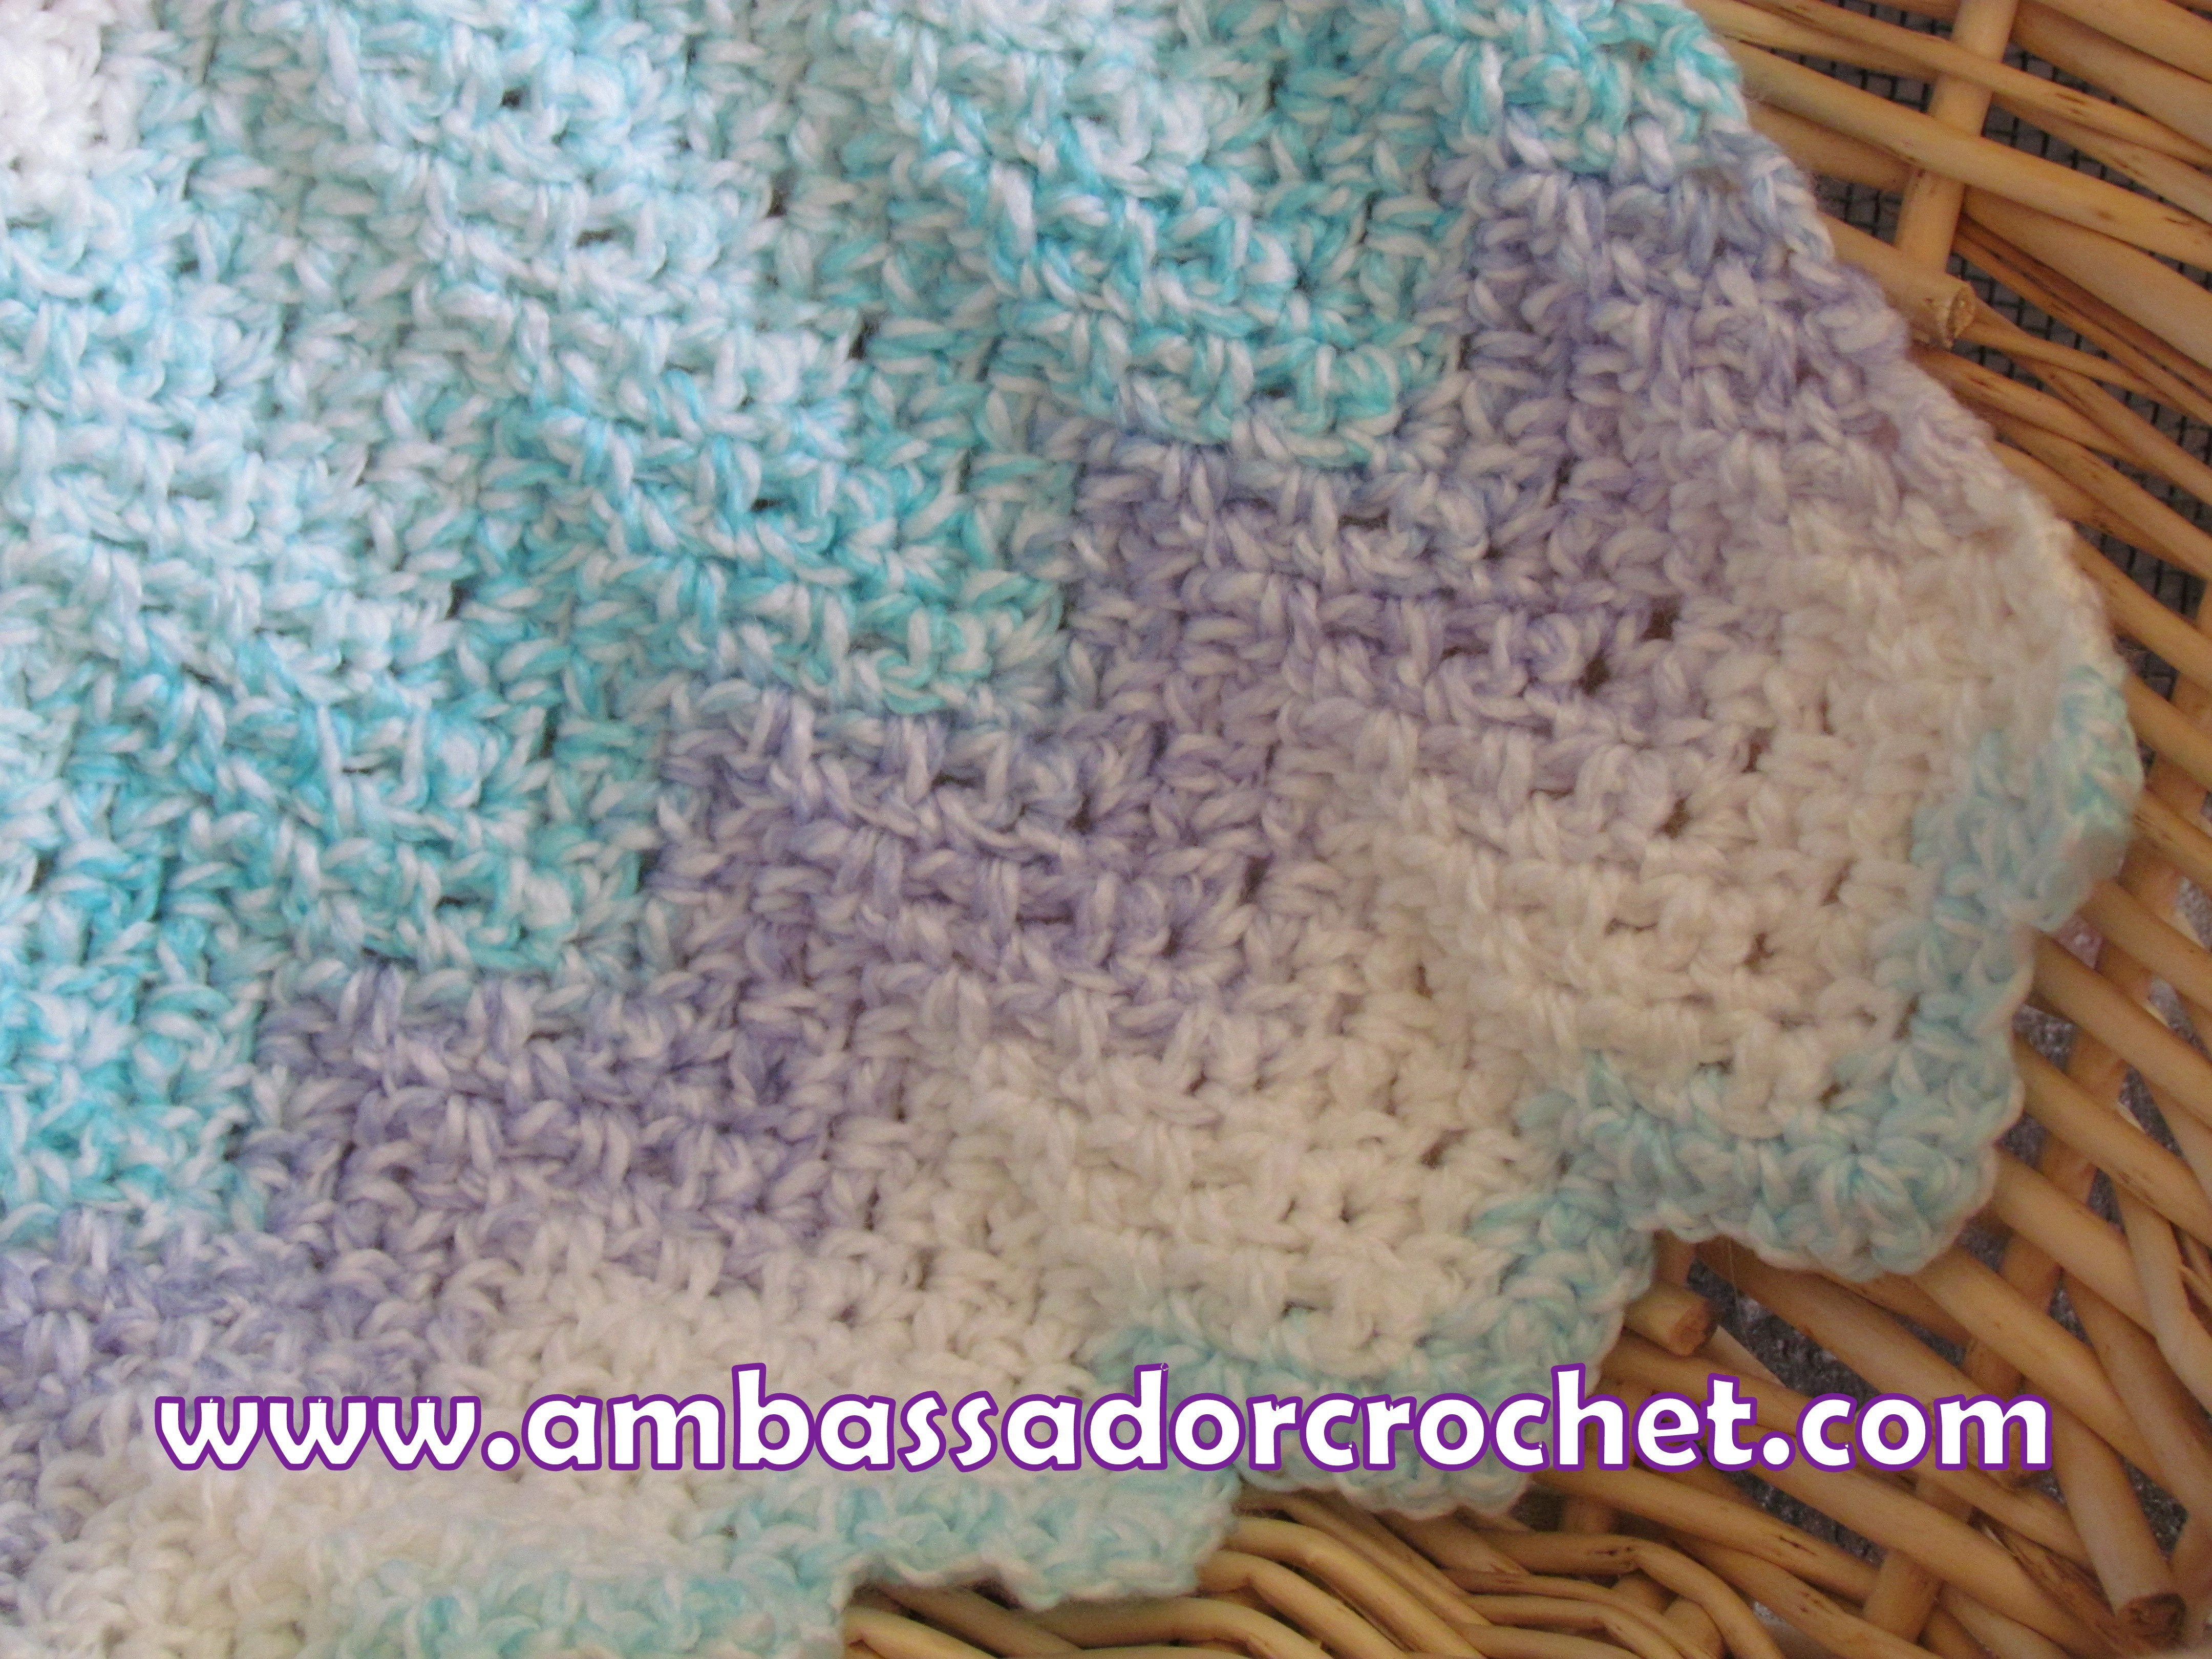 Begginer Crochet Projects Baby Blankets Free Beginner Crochet Ba Blanket Patterns My Tunisian Pattern